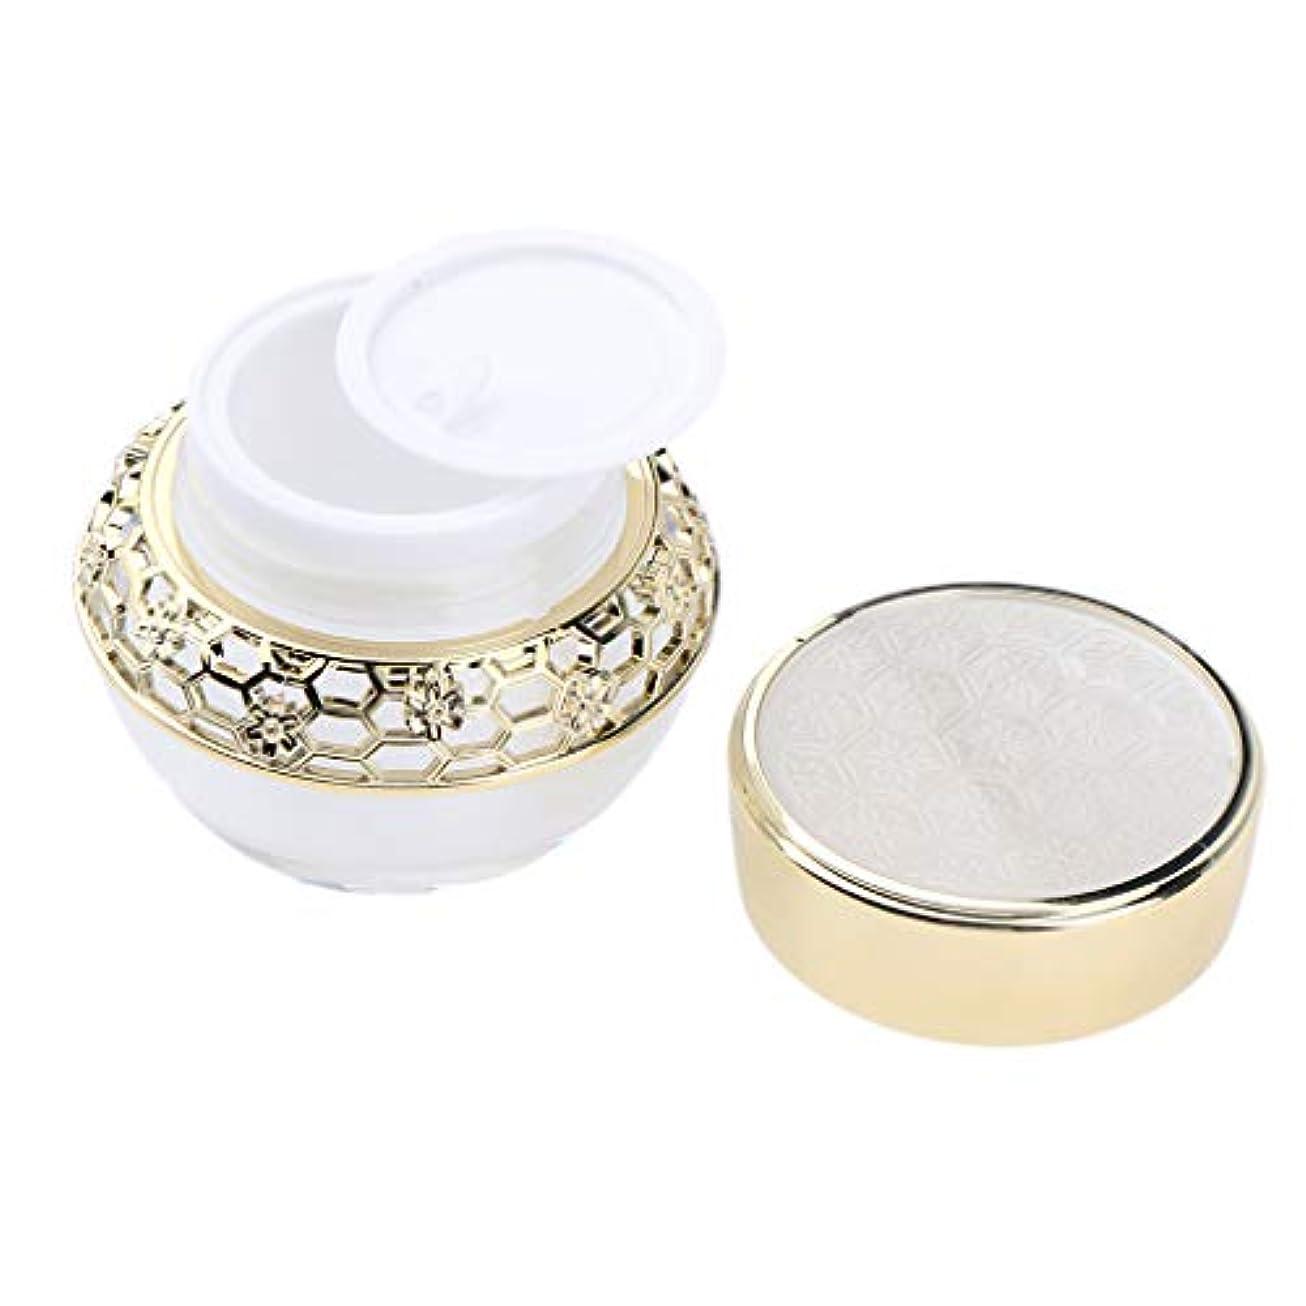 SM SunniMix クリーム 容器 クリームケース 化粧品 アクリル ローション 詰替え容器 2サイズ選べ - 30g